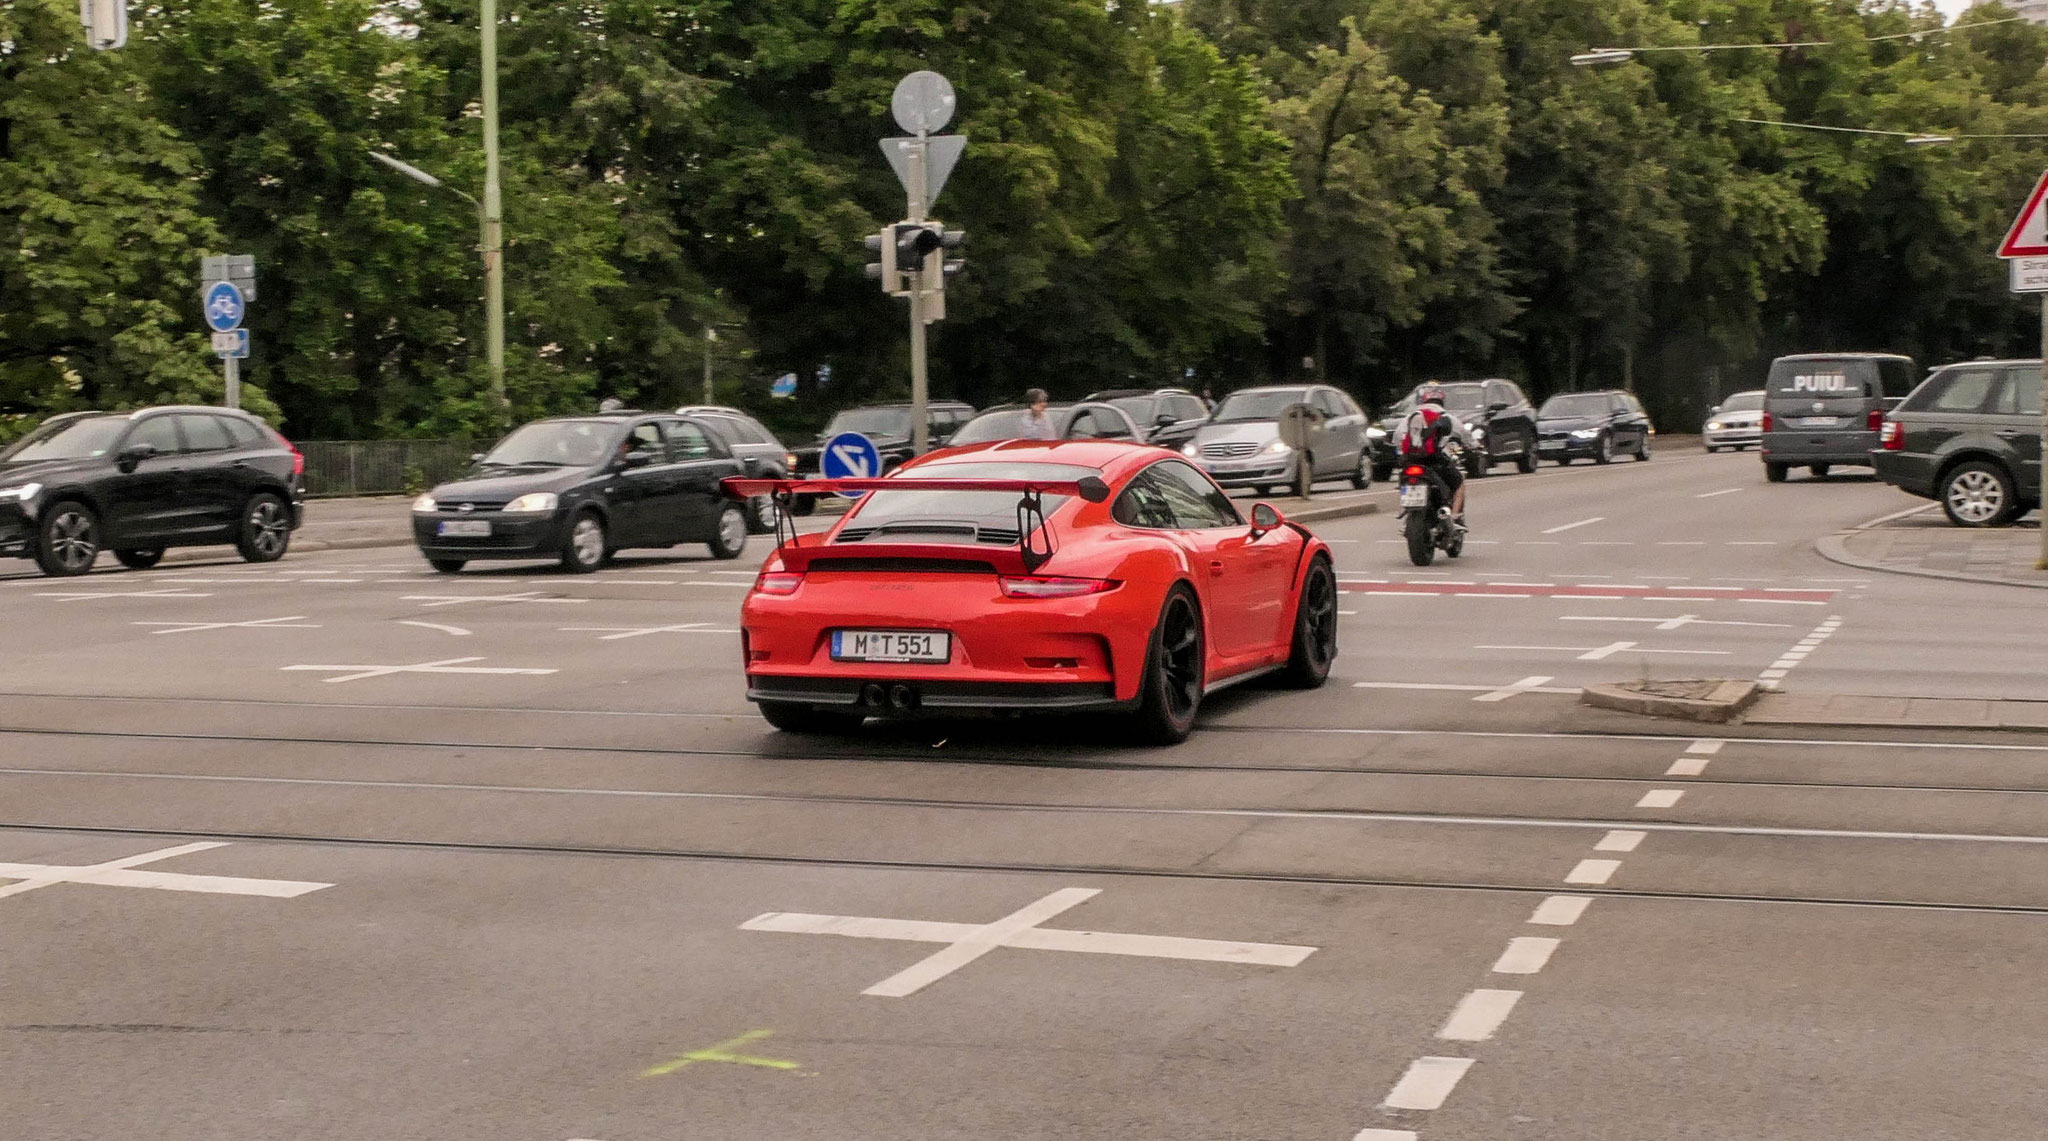 Porsche 911 GT3 RS - M-T-551